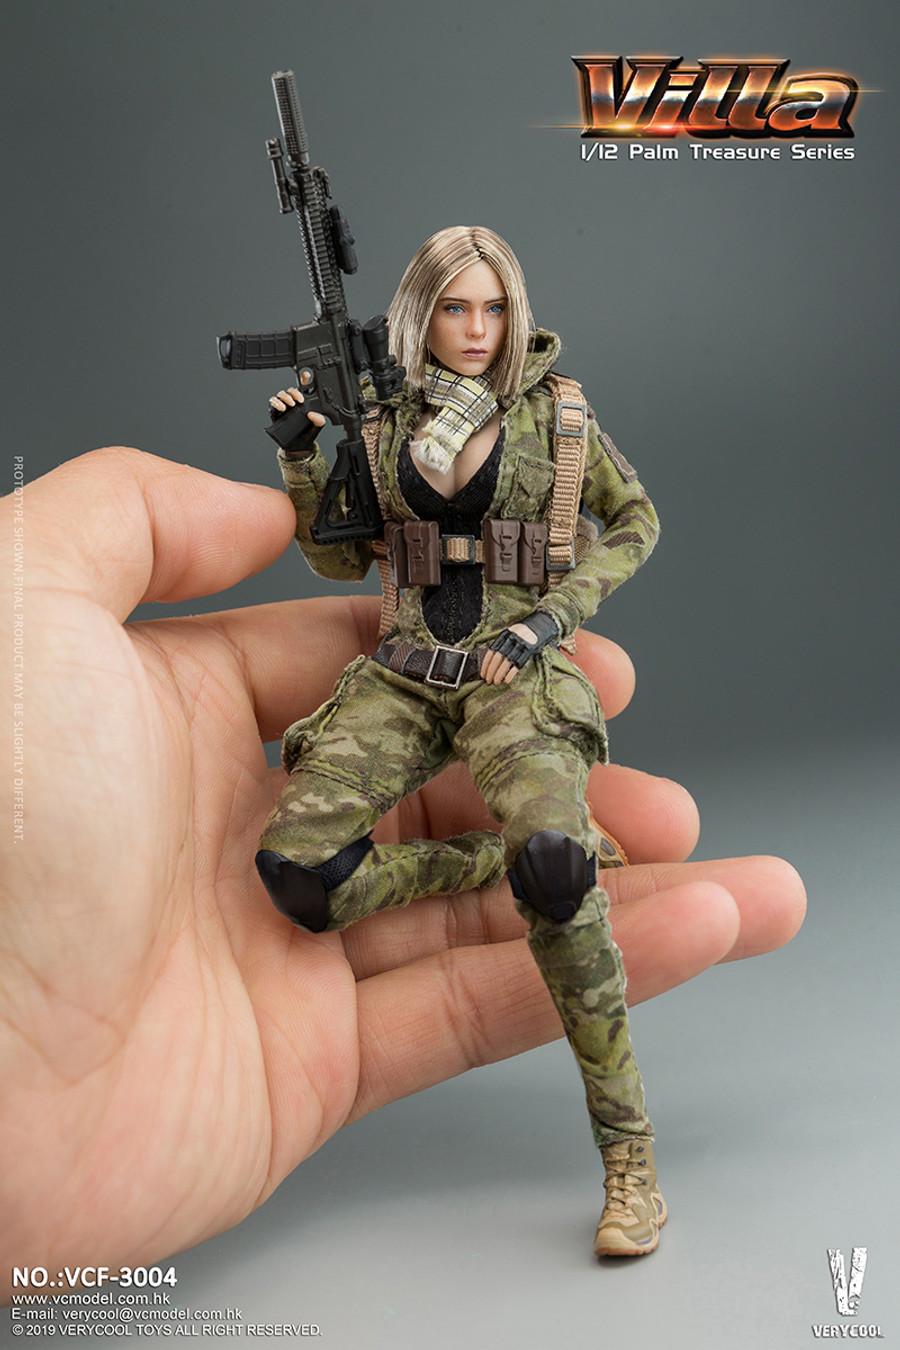 Very Cool - 1/12 Palm Treasure Series - MC Camouflage Women Soldier - Villa